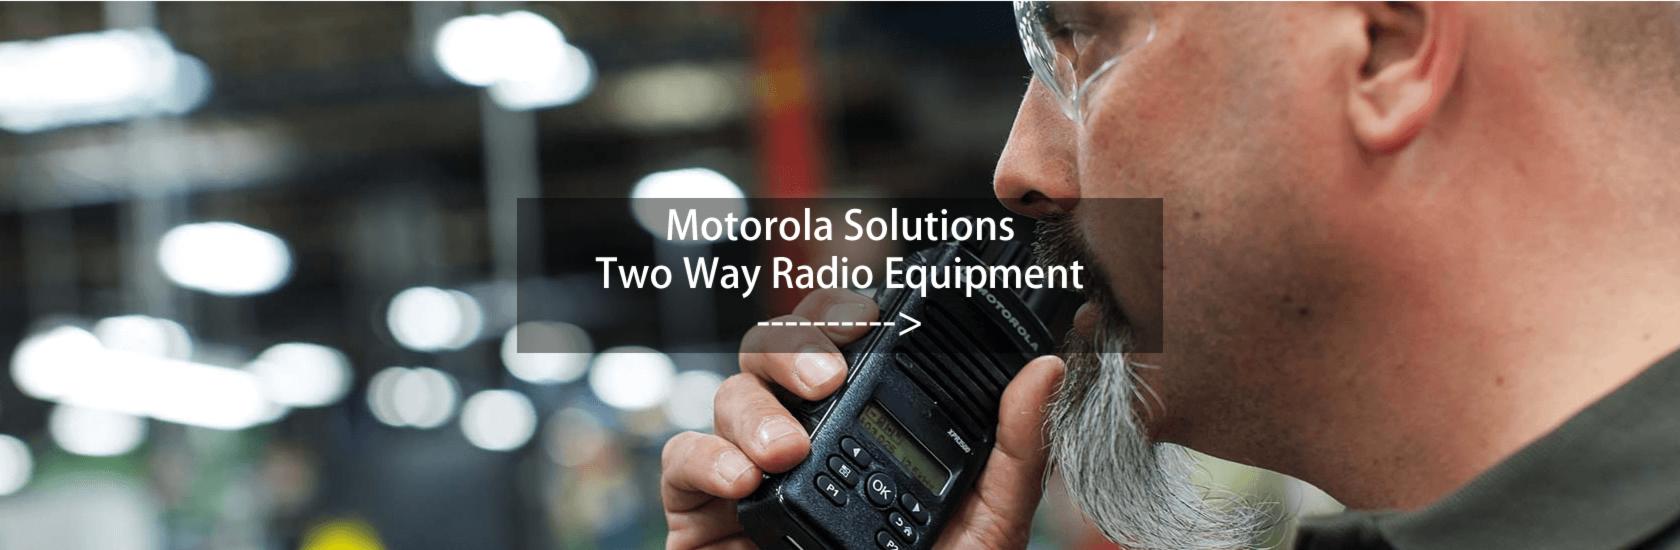 Motorola DP4000 Series Radios